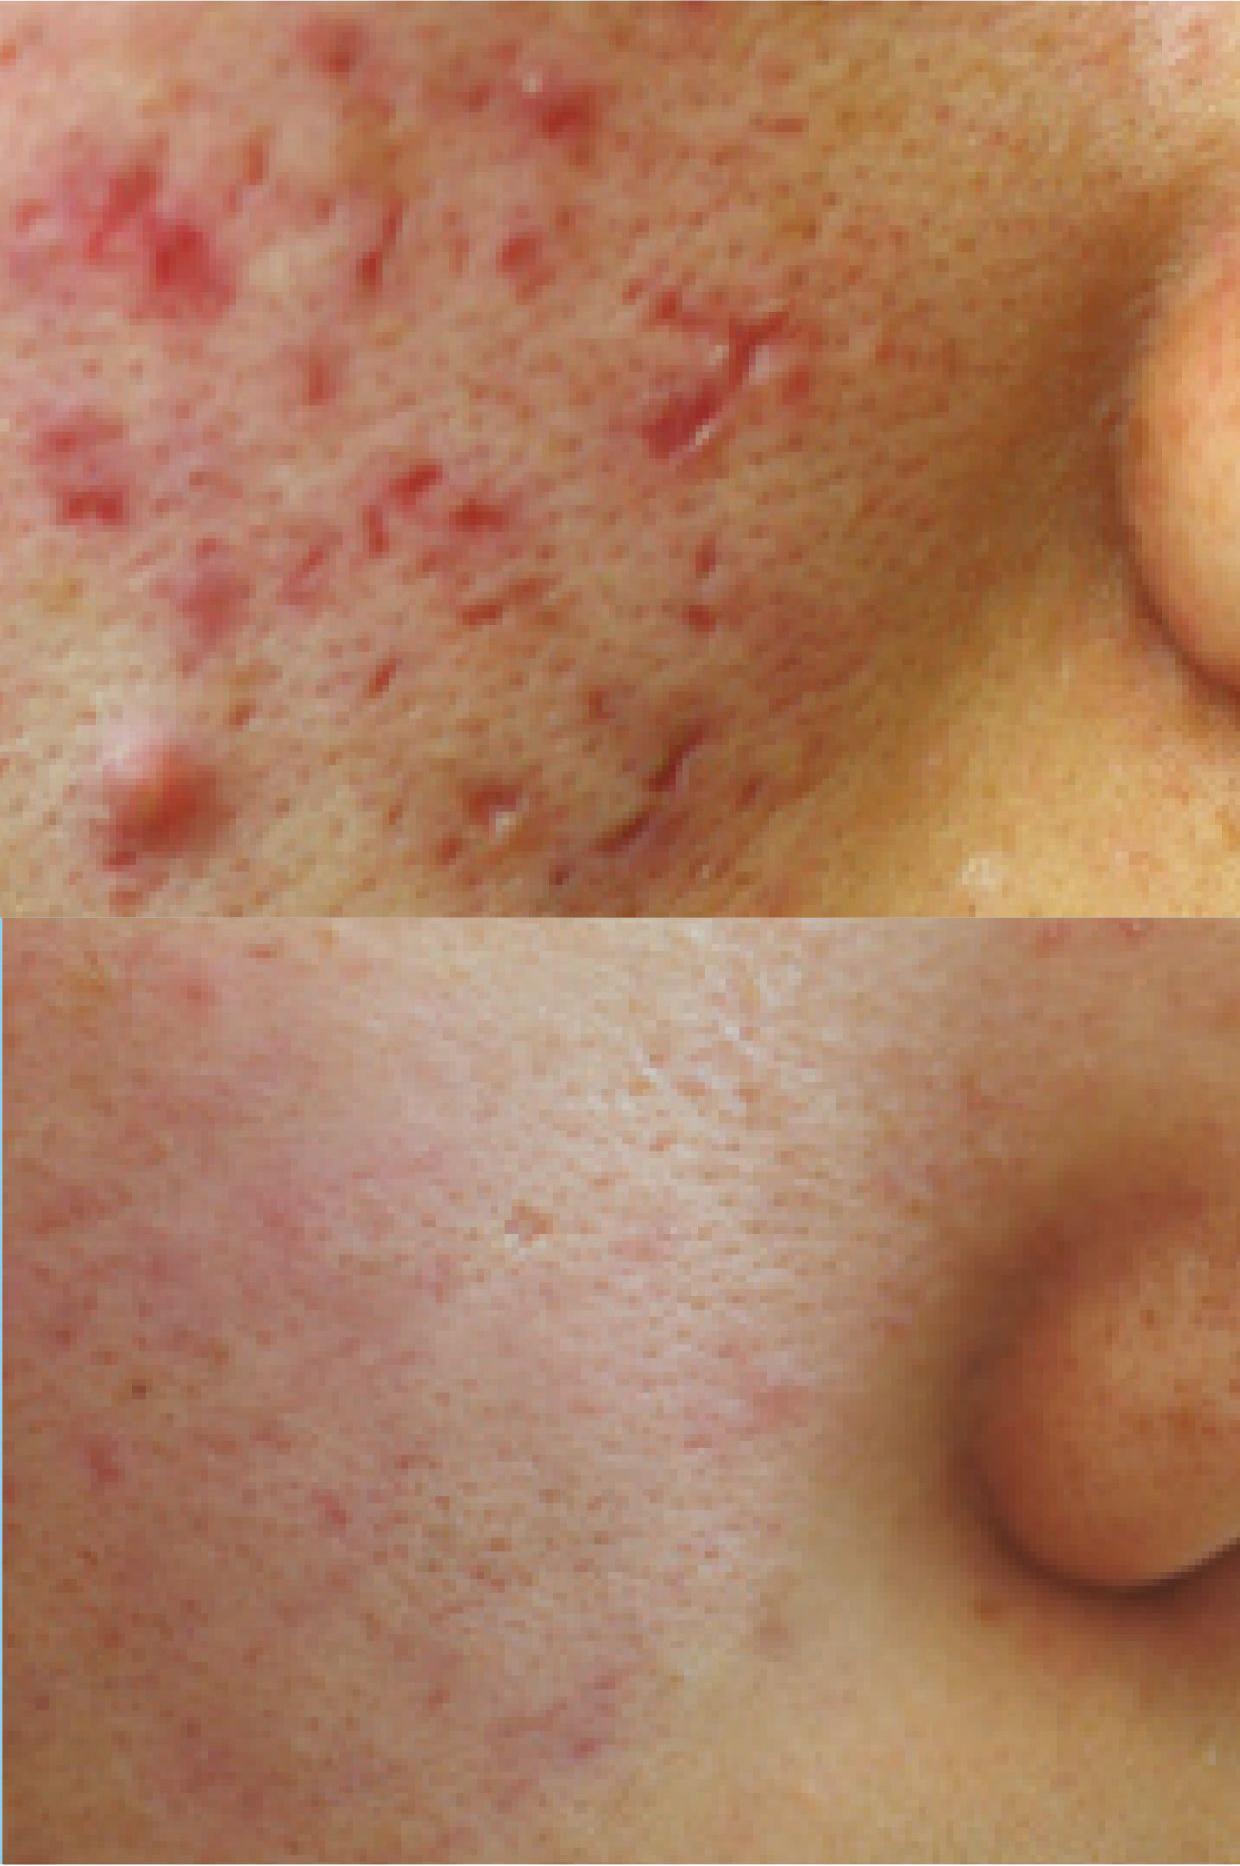 Acne treatment mississauga medical acne clinic lucie for Acne salon treatments